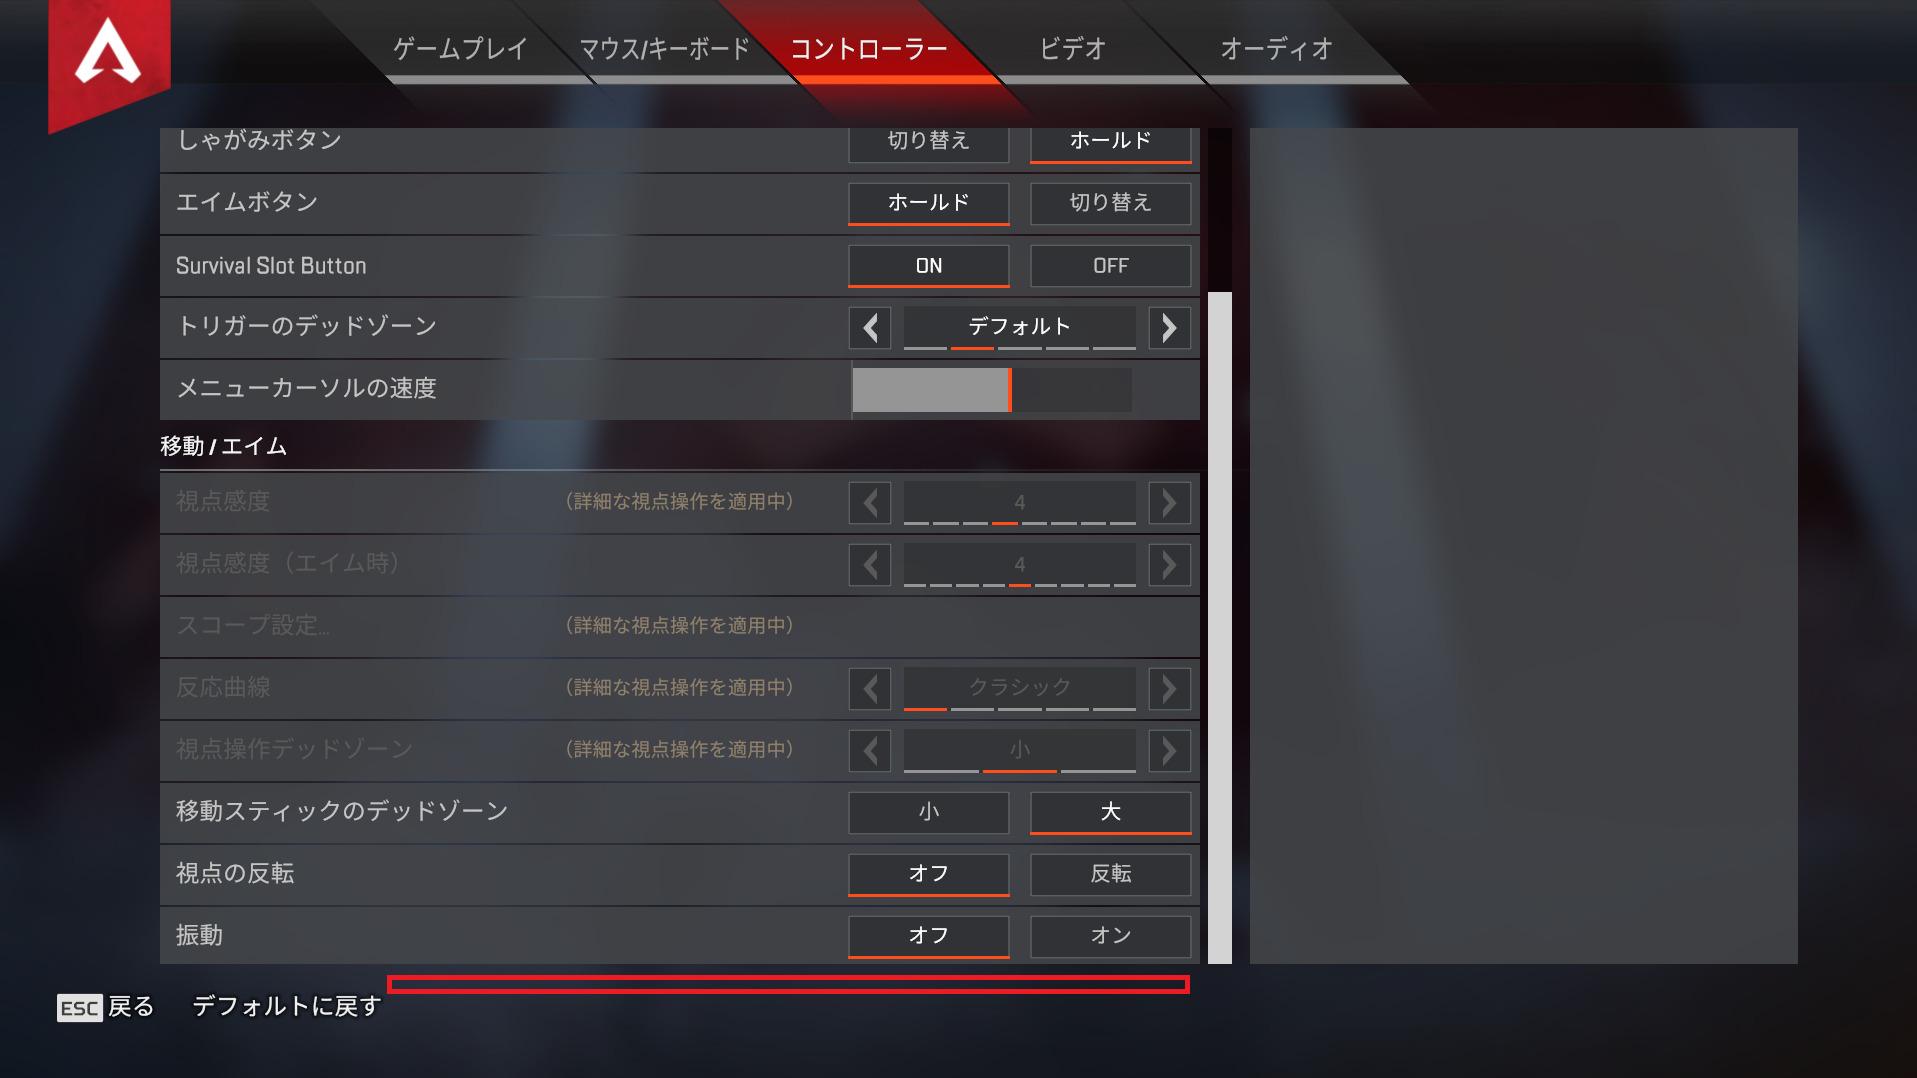 【Apex Legends】詳細な視点感度設定がないときの対処法【エーペックスレジェンズ】【アップデート】